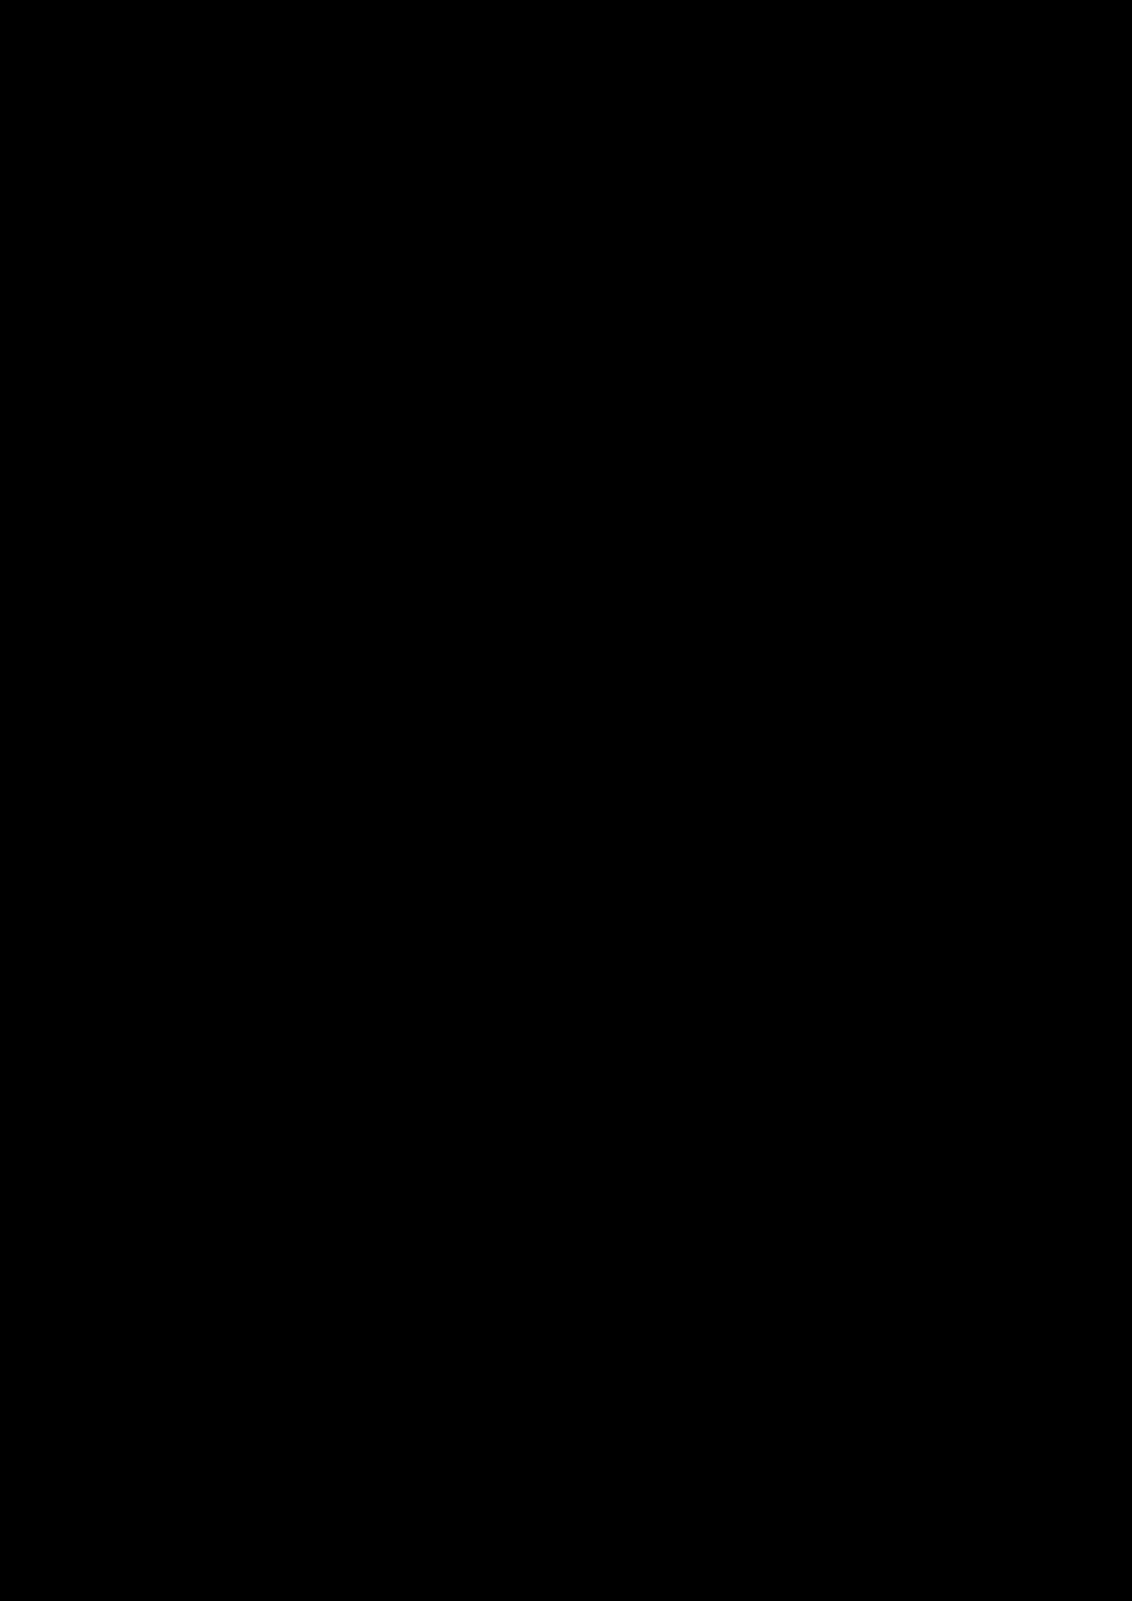 Okean Pustotyi slide, Image 46